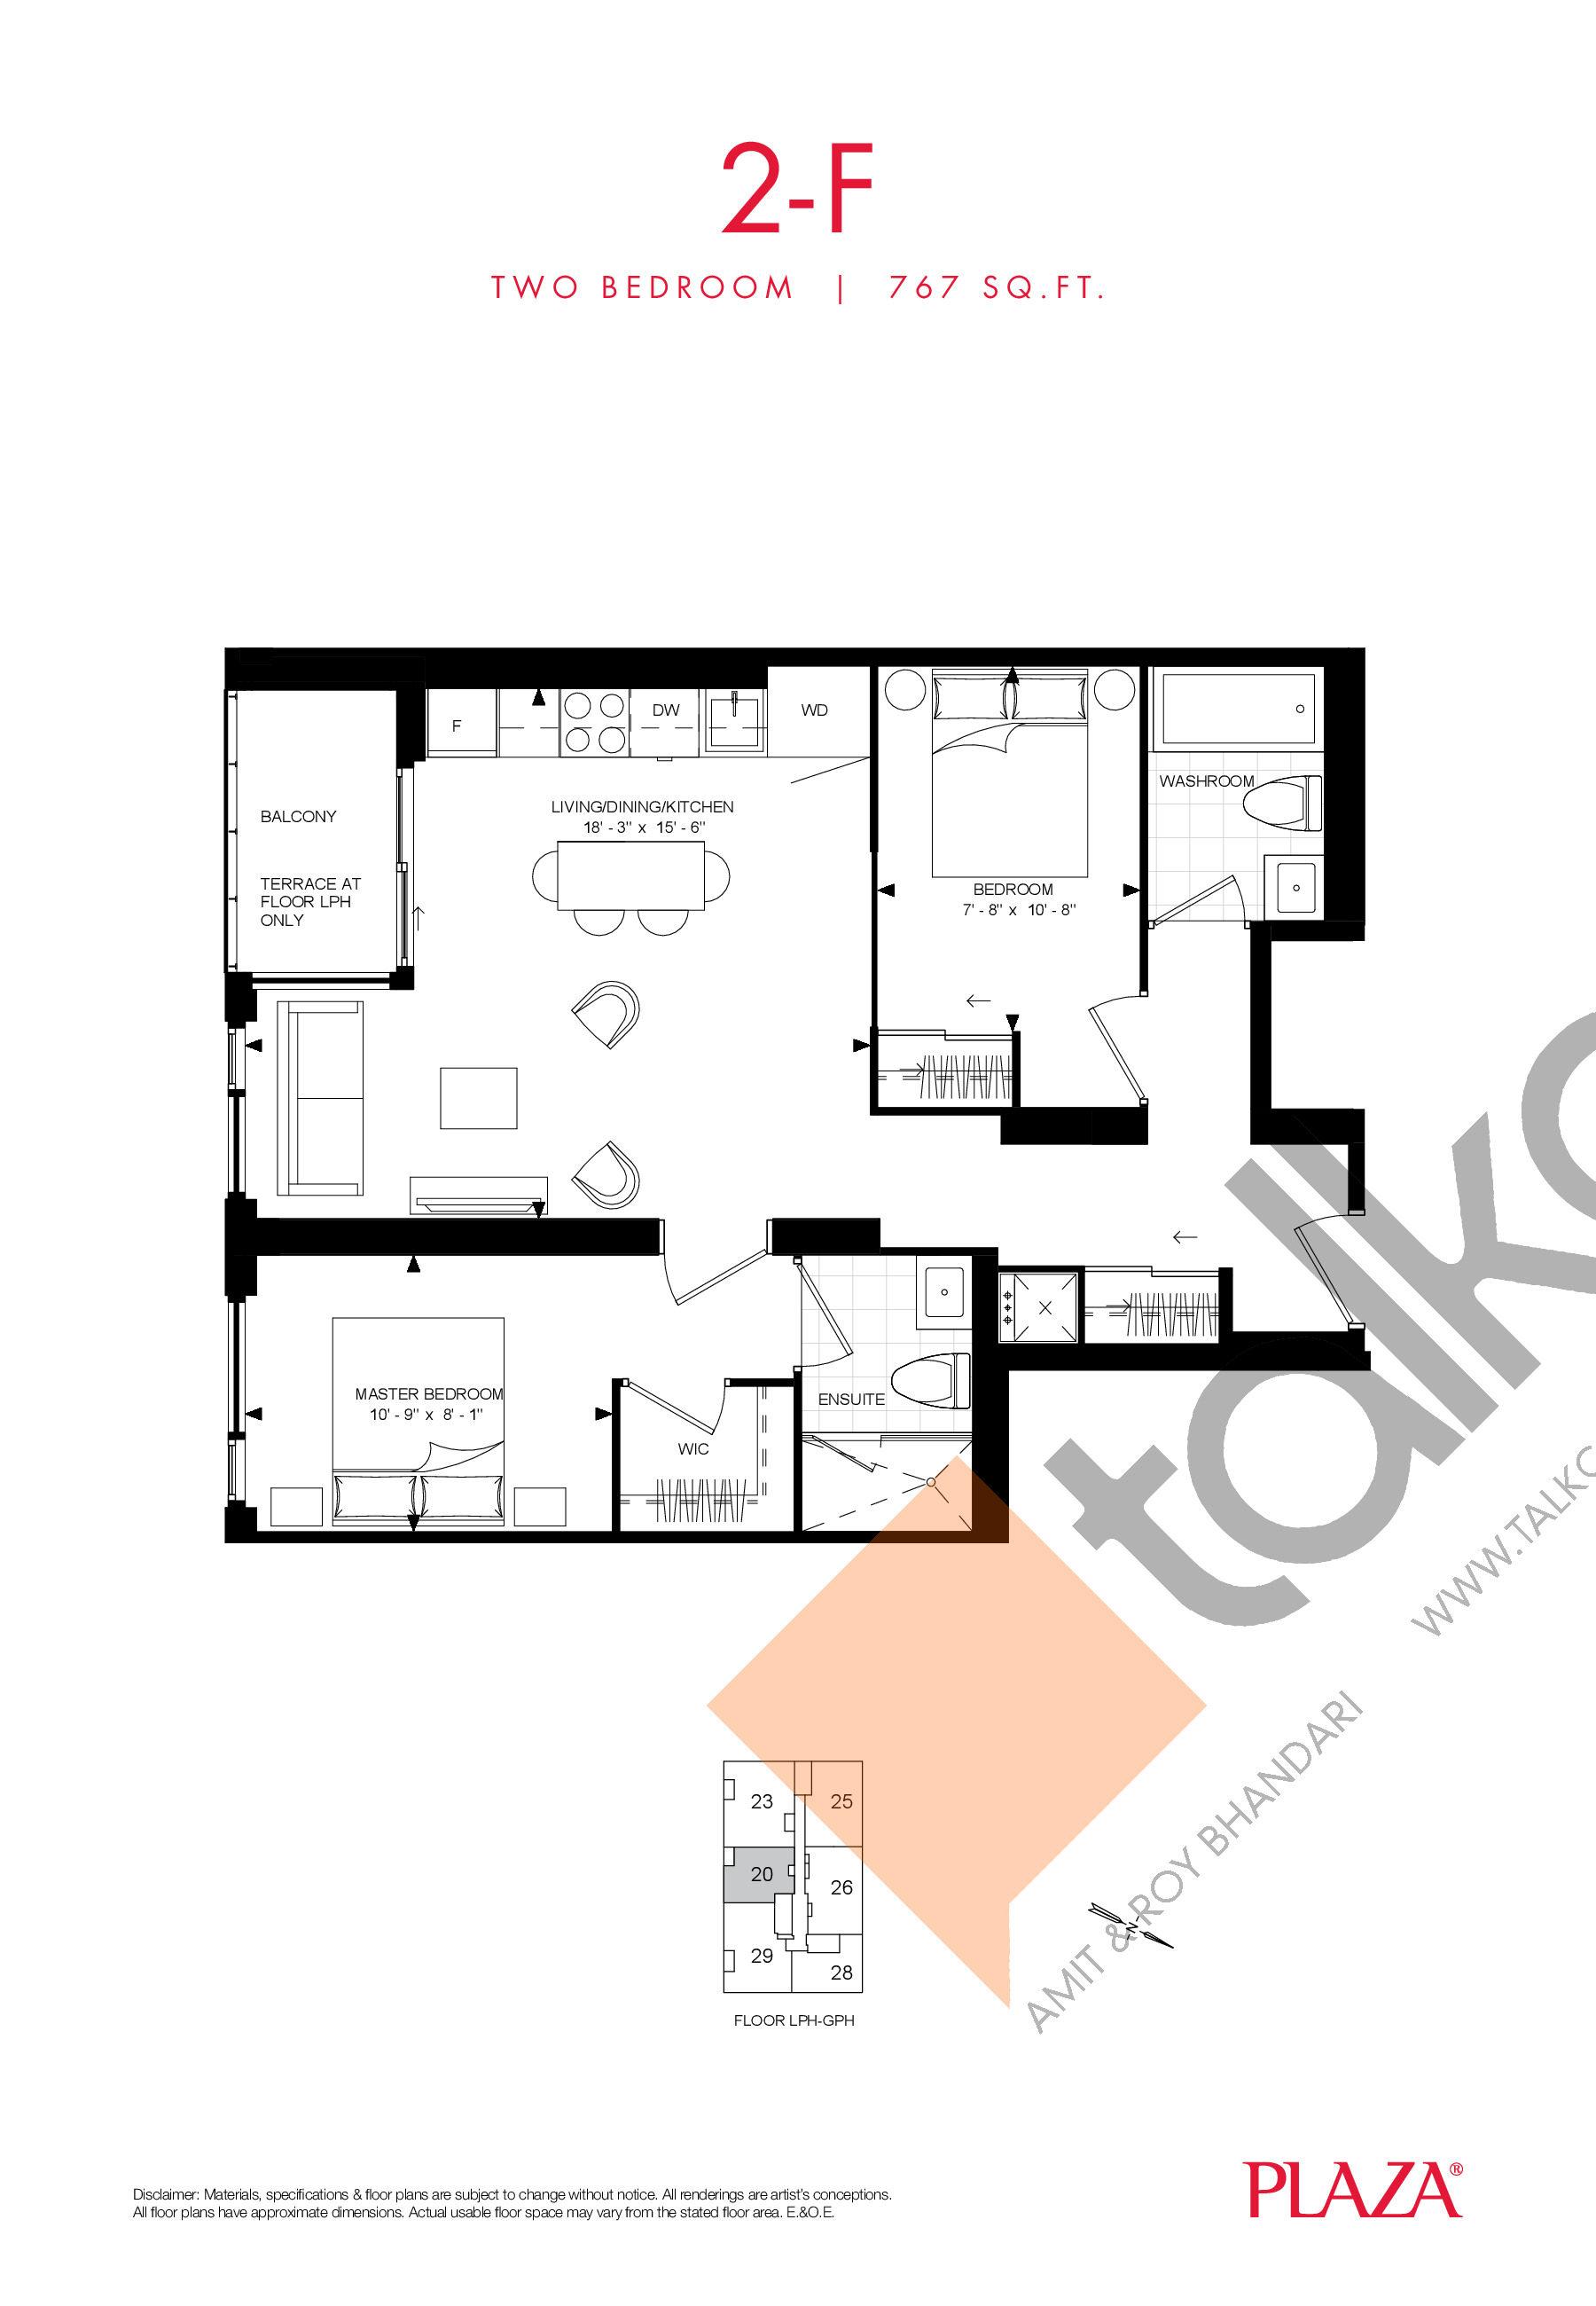 2-F Floor Plan at Encore Theatre District Condos - 767 sq.ft